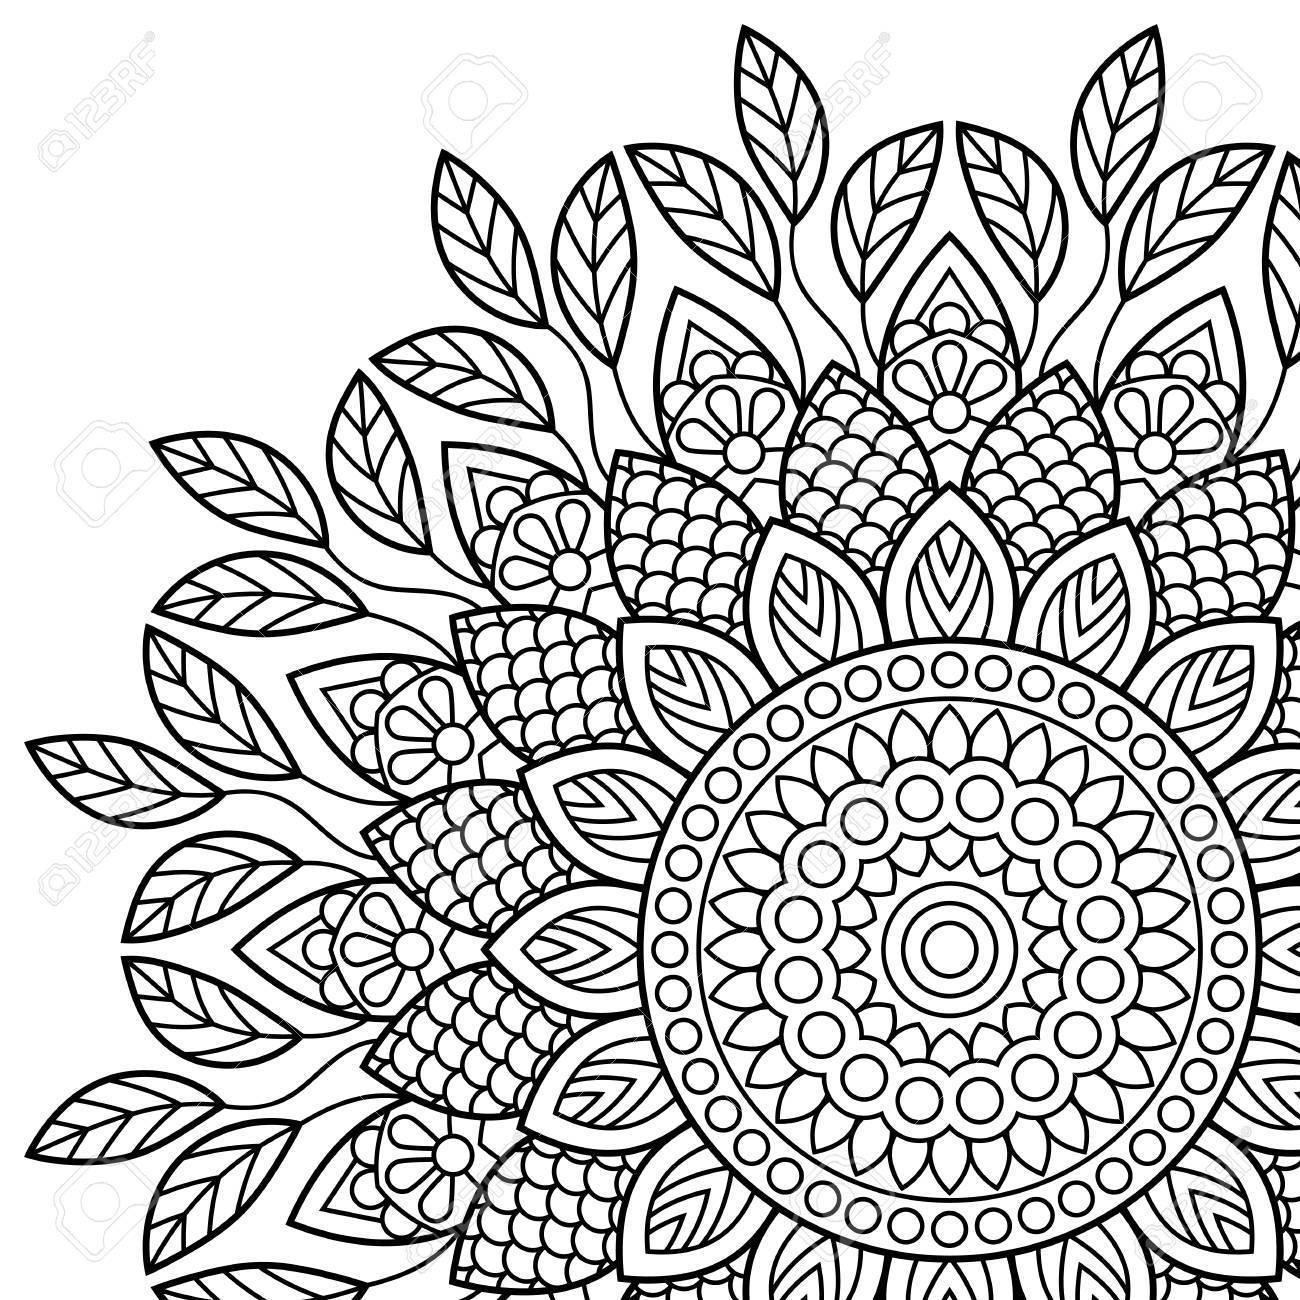 Mandala. Coloring book pages. Indian antistress medallion. Abstract..